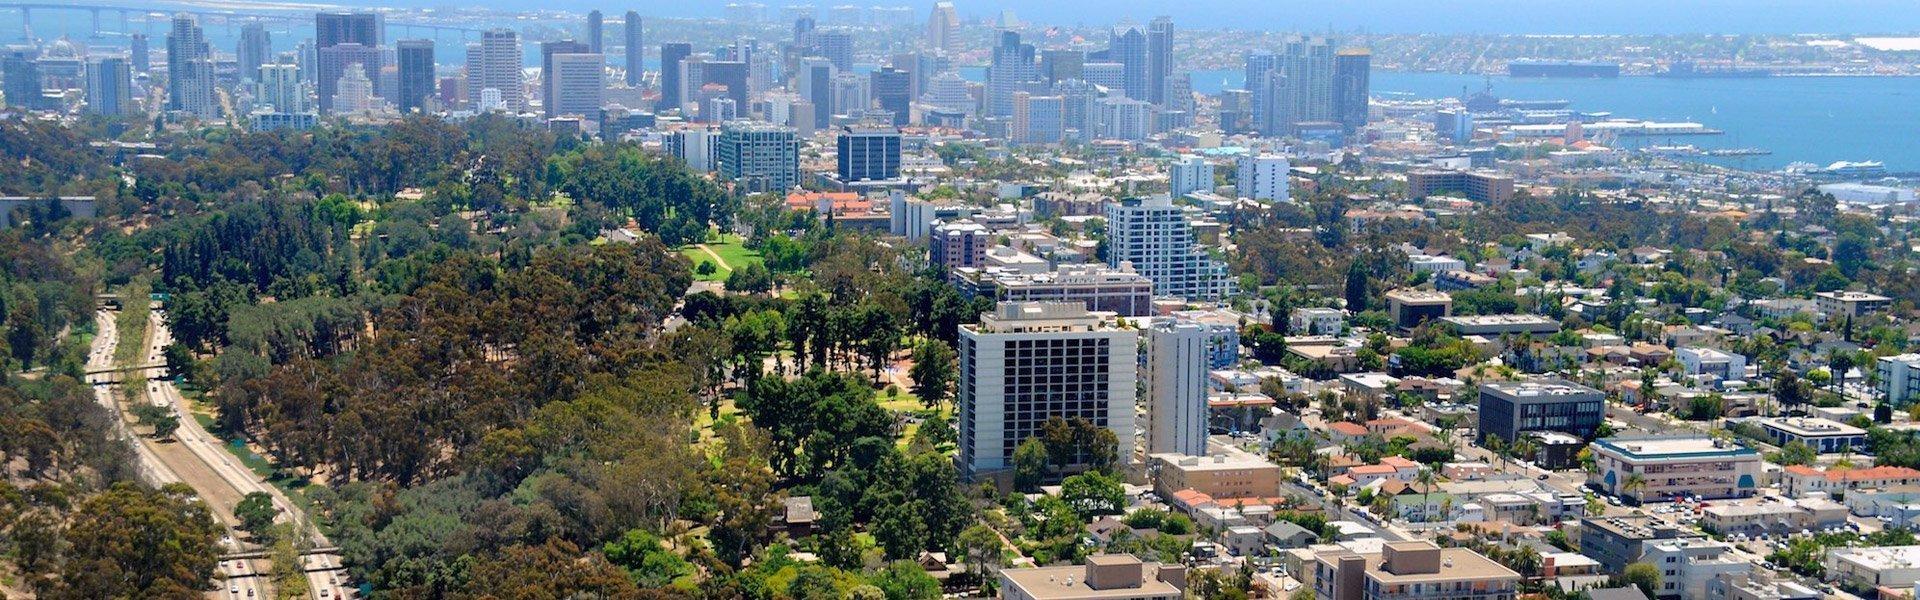 Kensington San Diego Homes For Sale